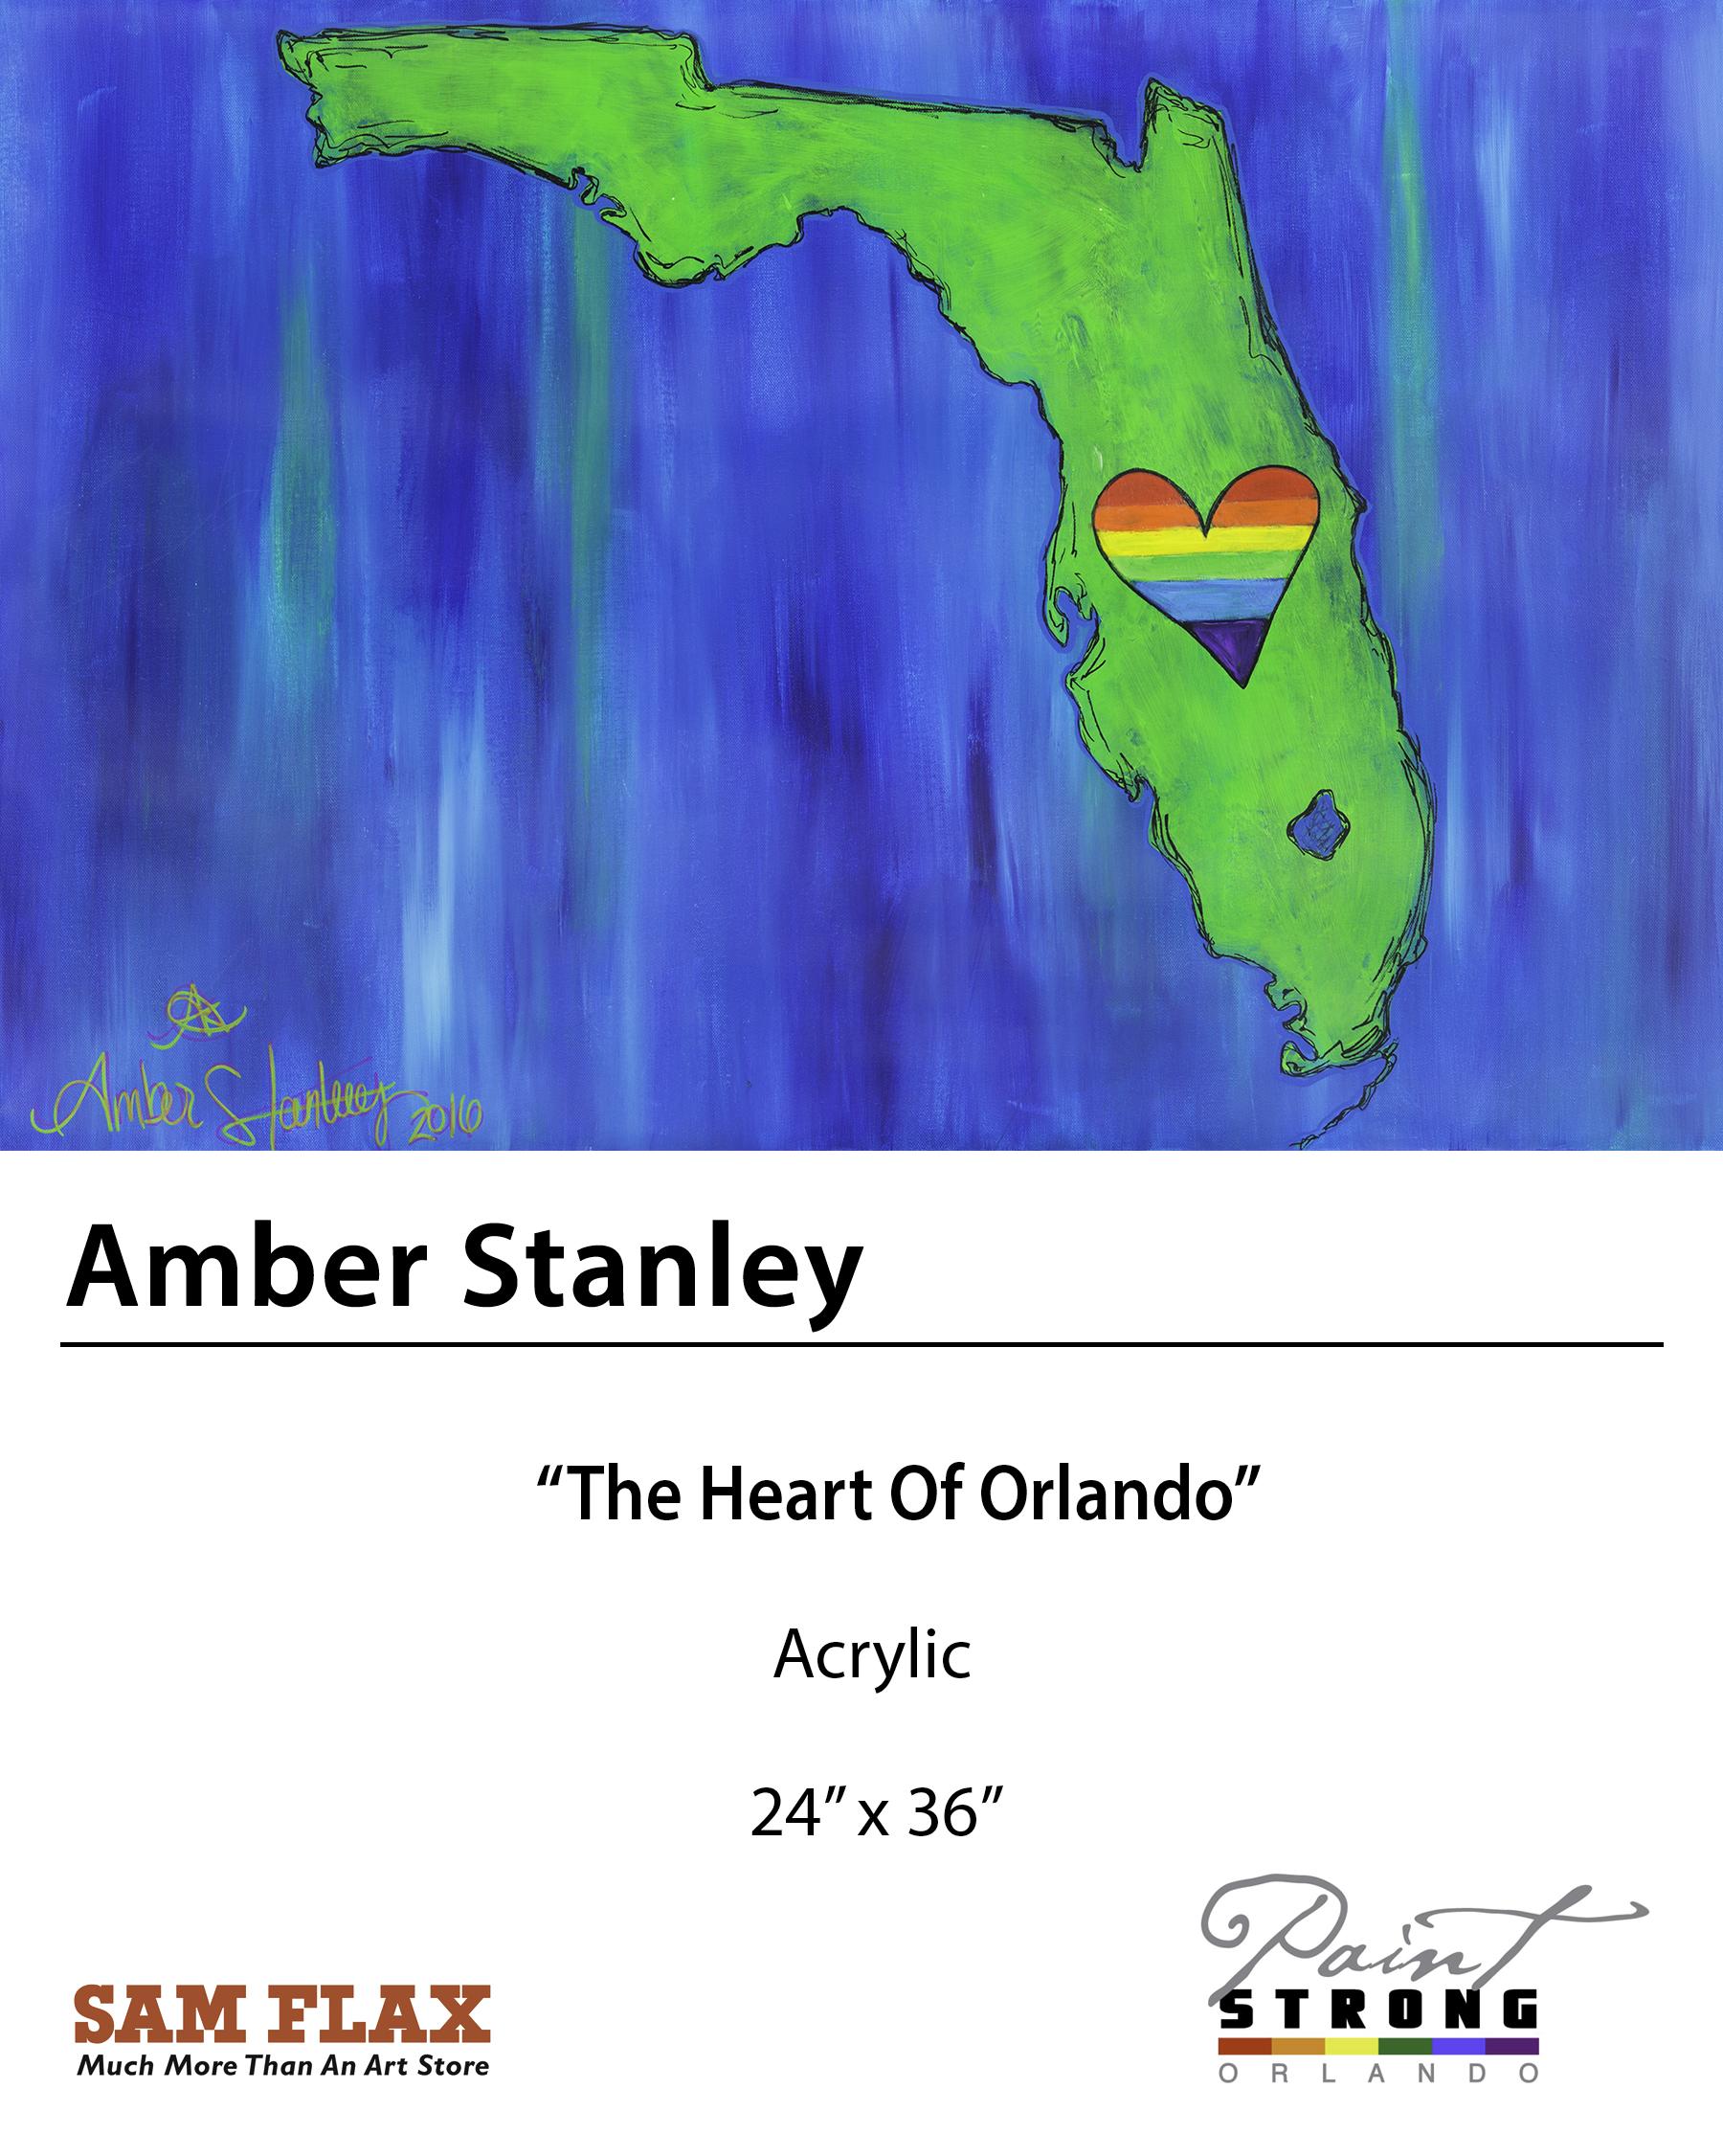 Amber Stanley